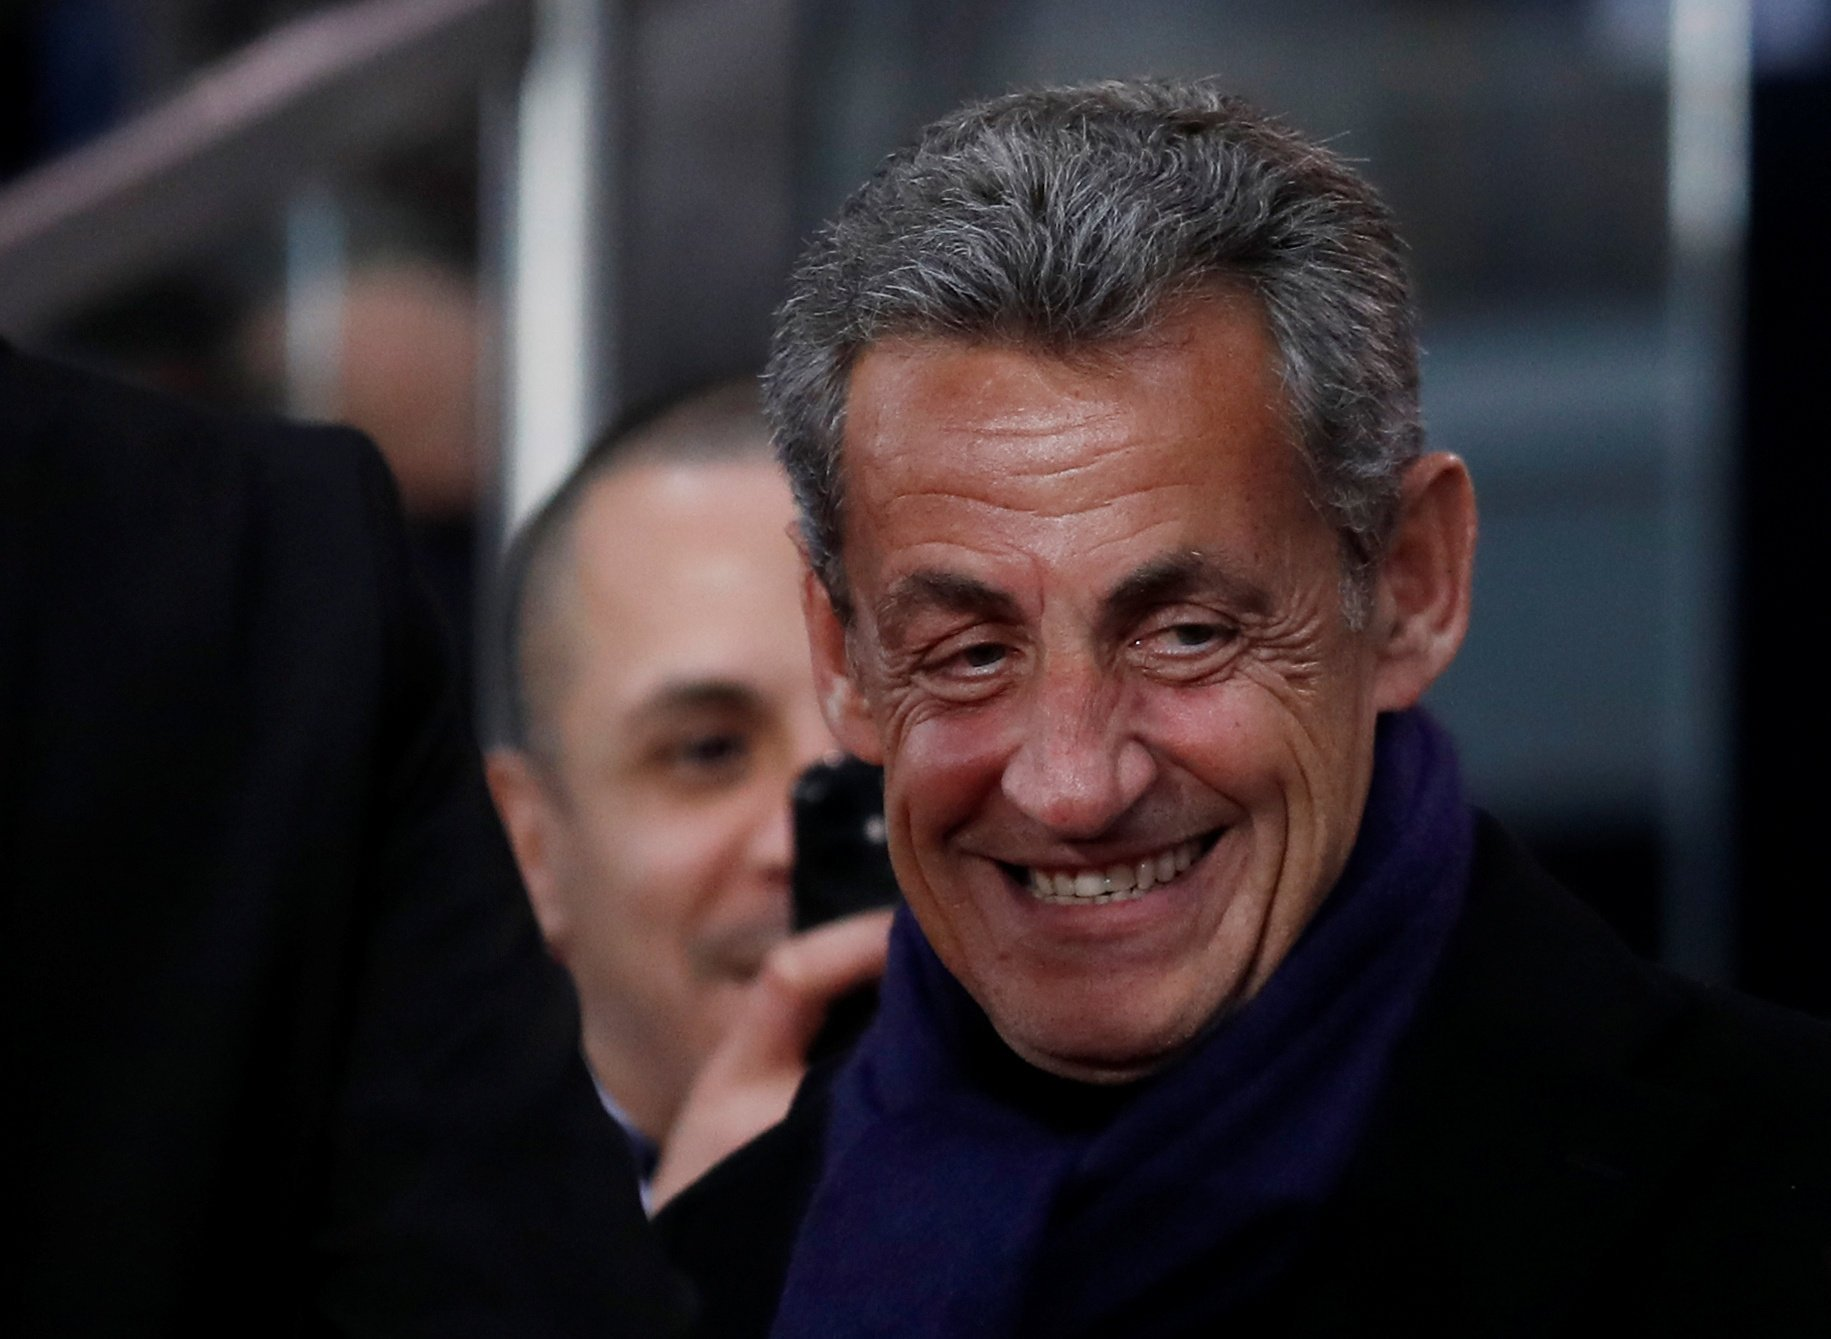 Former French President Sarkozy Calls Black People Monkeys Sparking Furor Daily Sabah